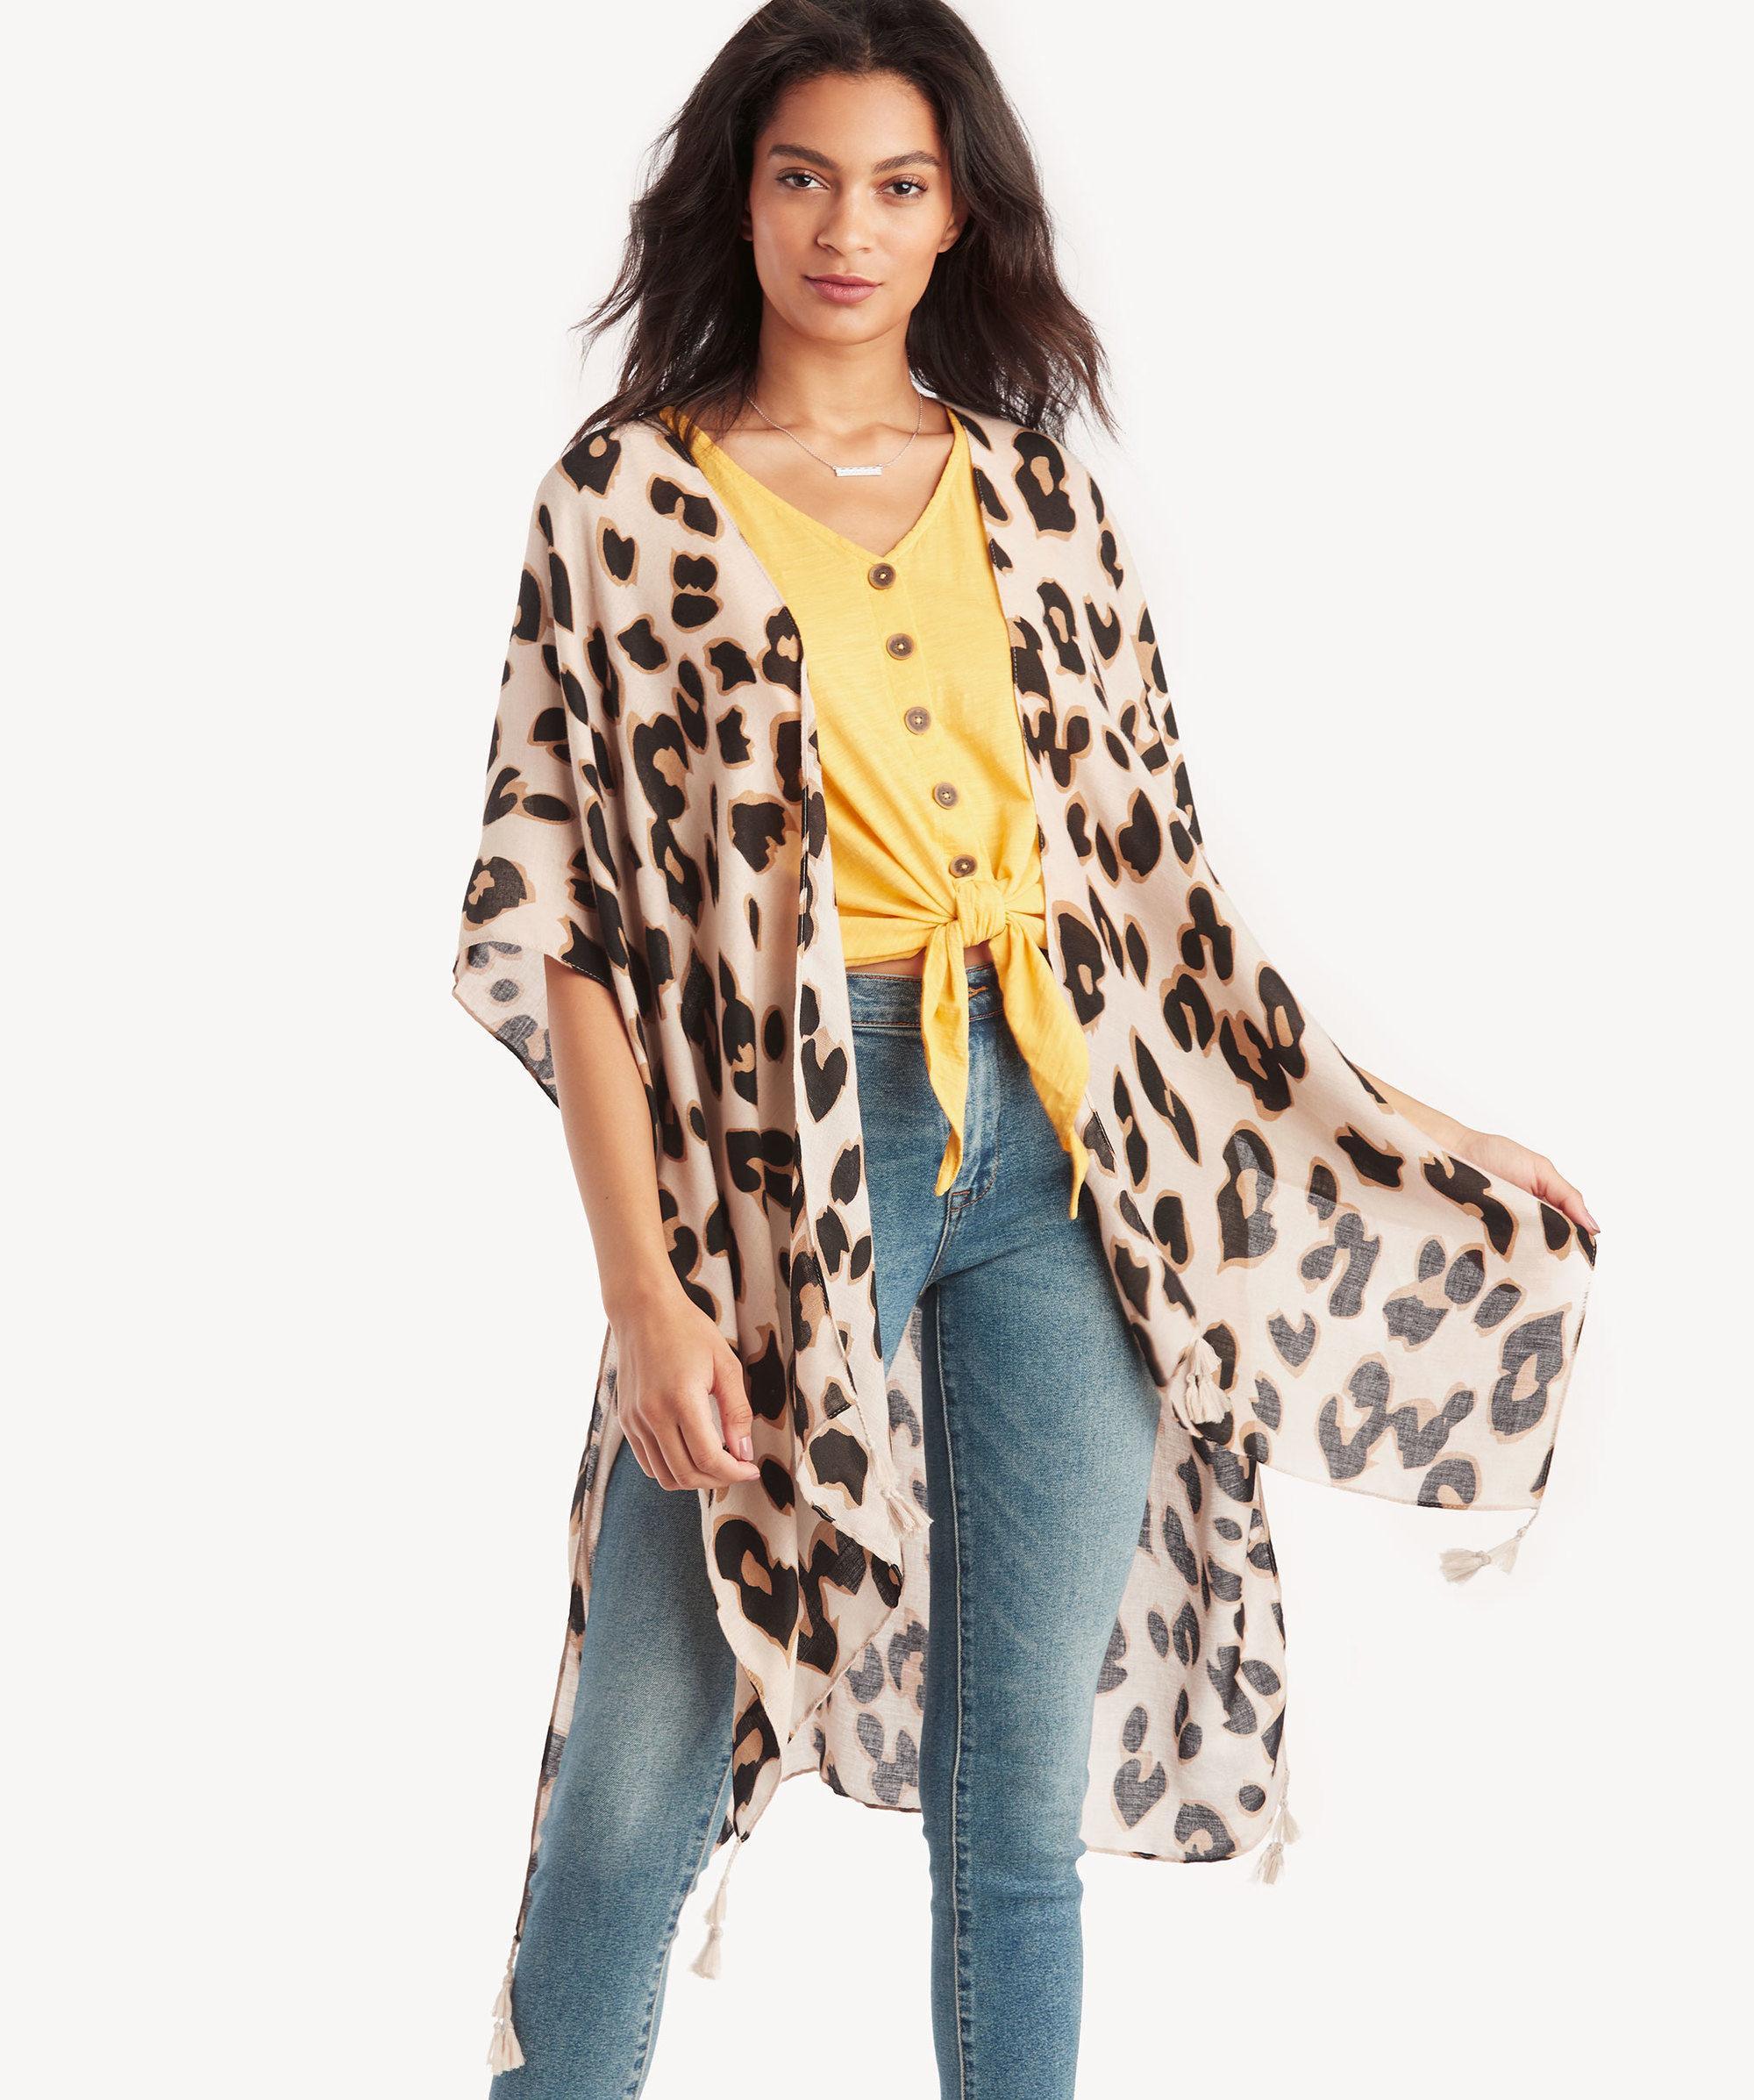 9acef6ab0091 ... Leopard Printed Kimono - Lyst. View fullscreen